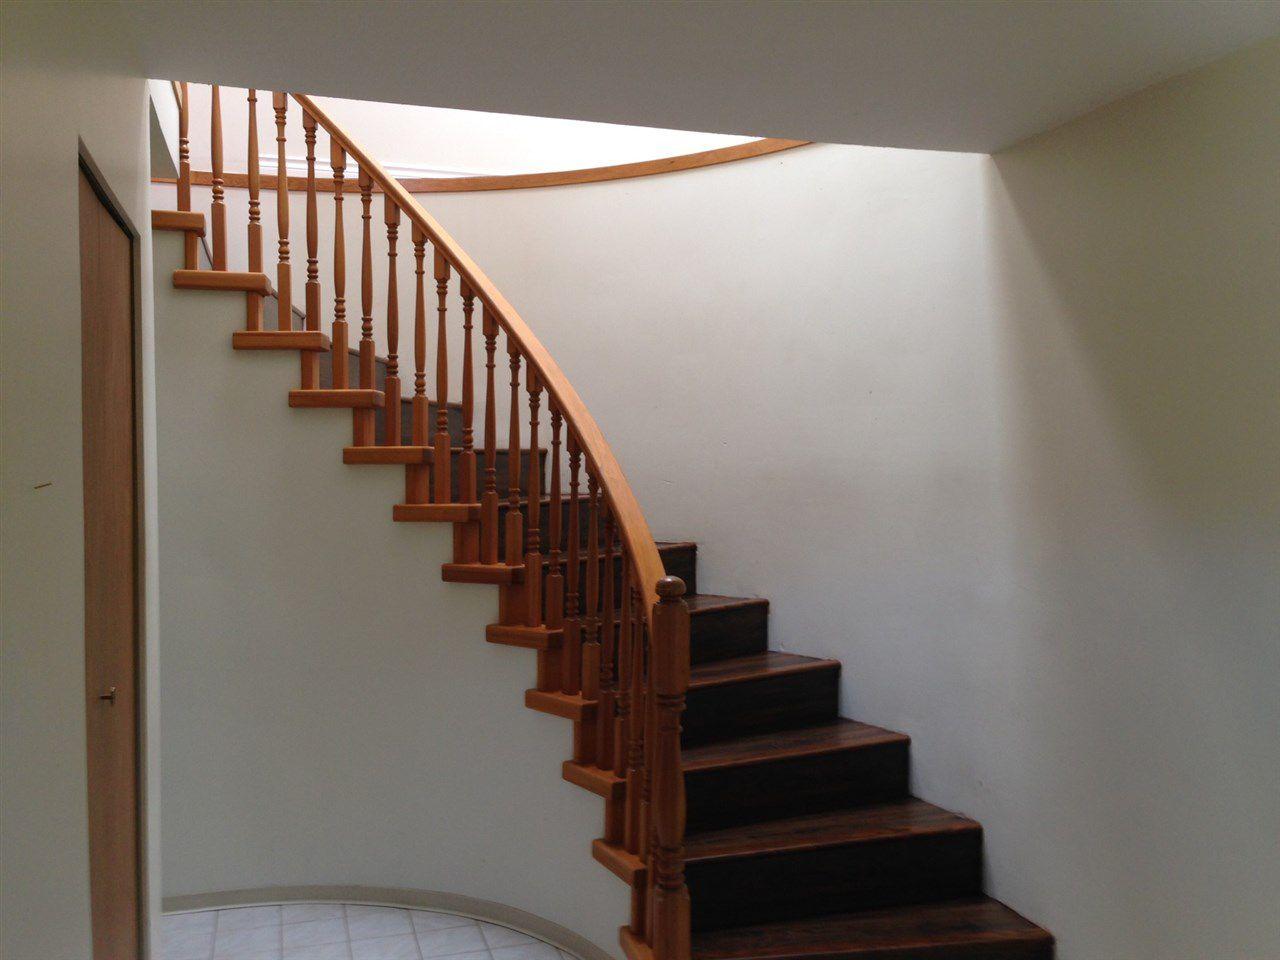 Main Photo: 1629 PRAIRIE Avenue in Port Coquitlam: Glenwood PQ House for sale : MLS®# R2168545